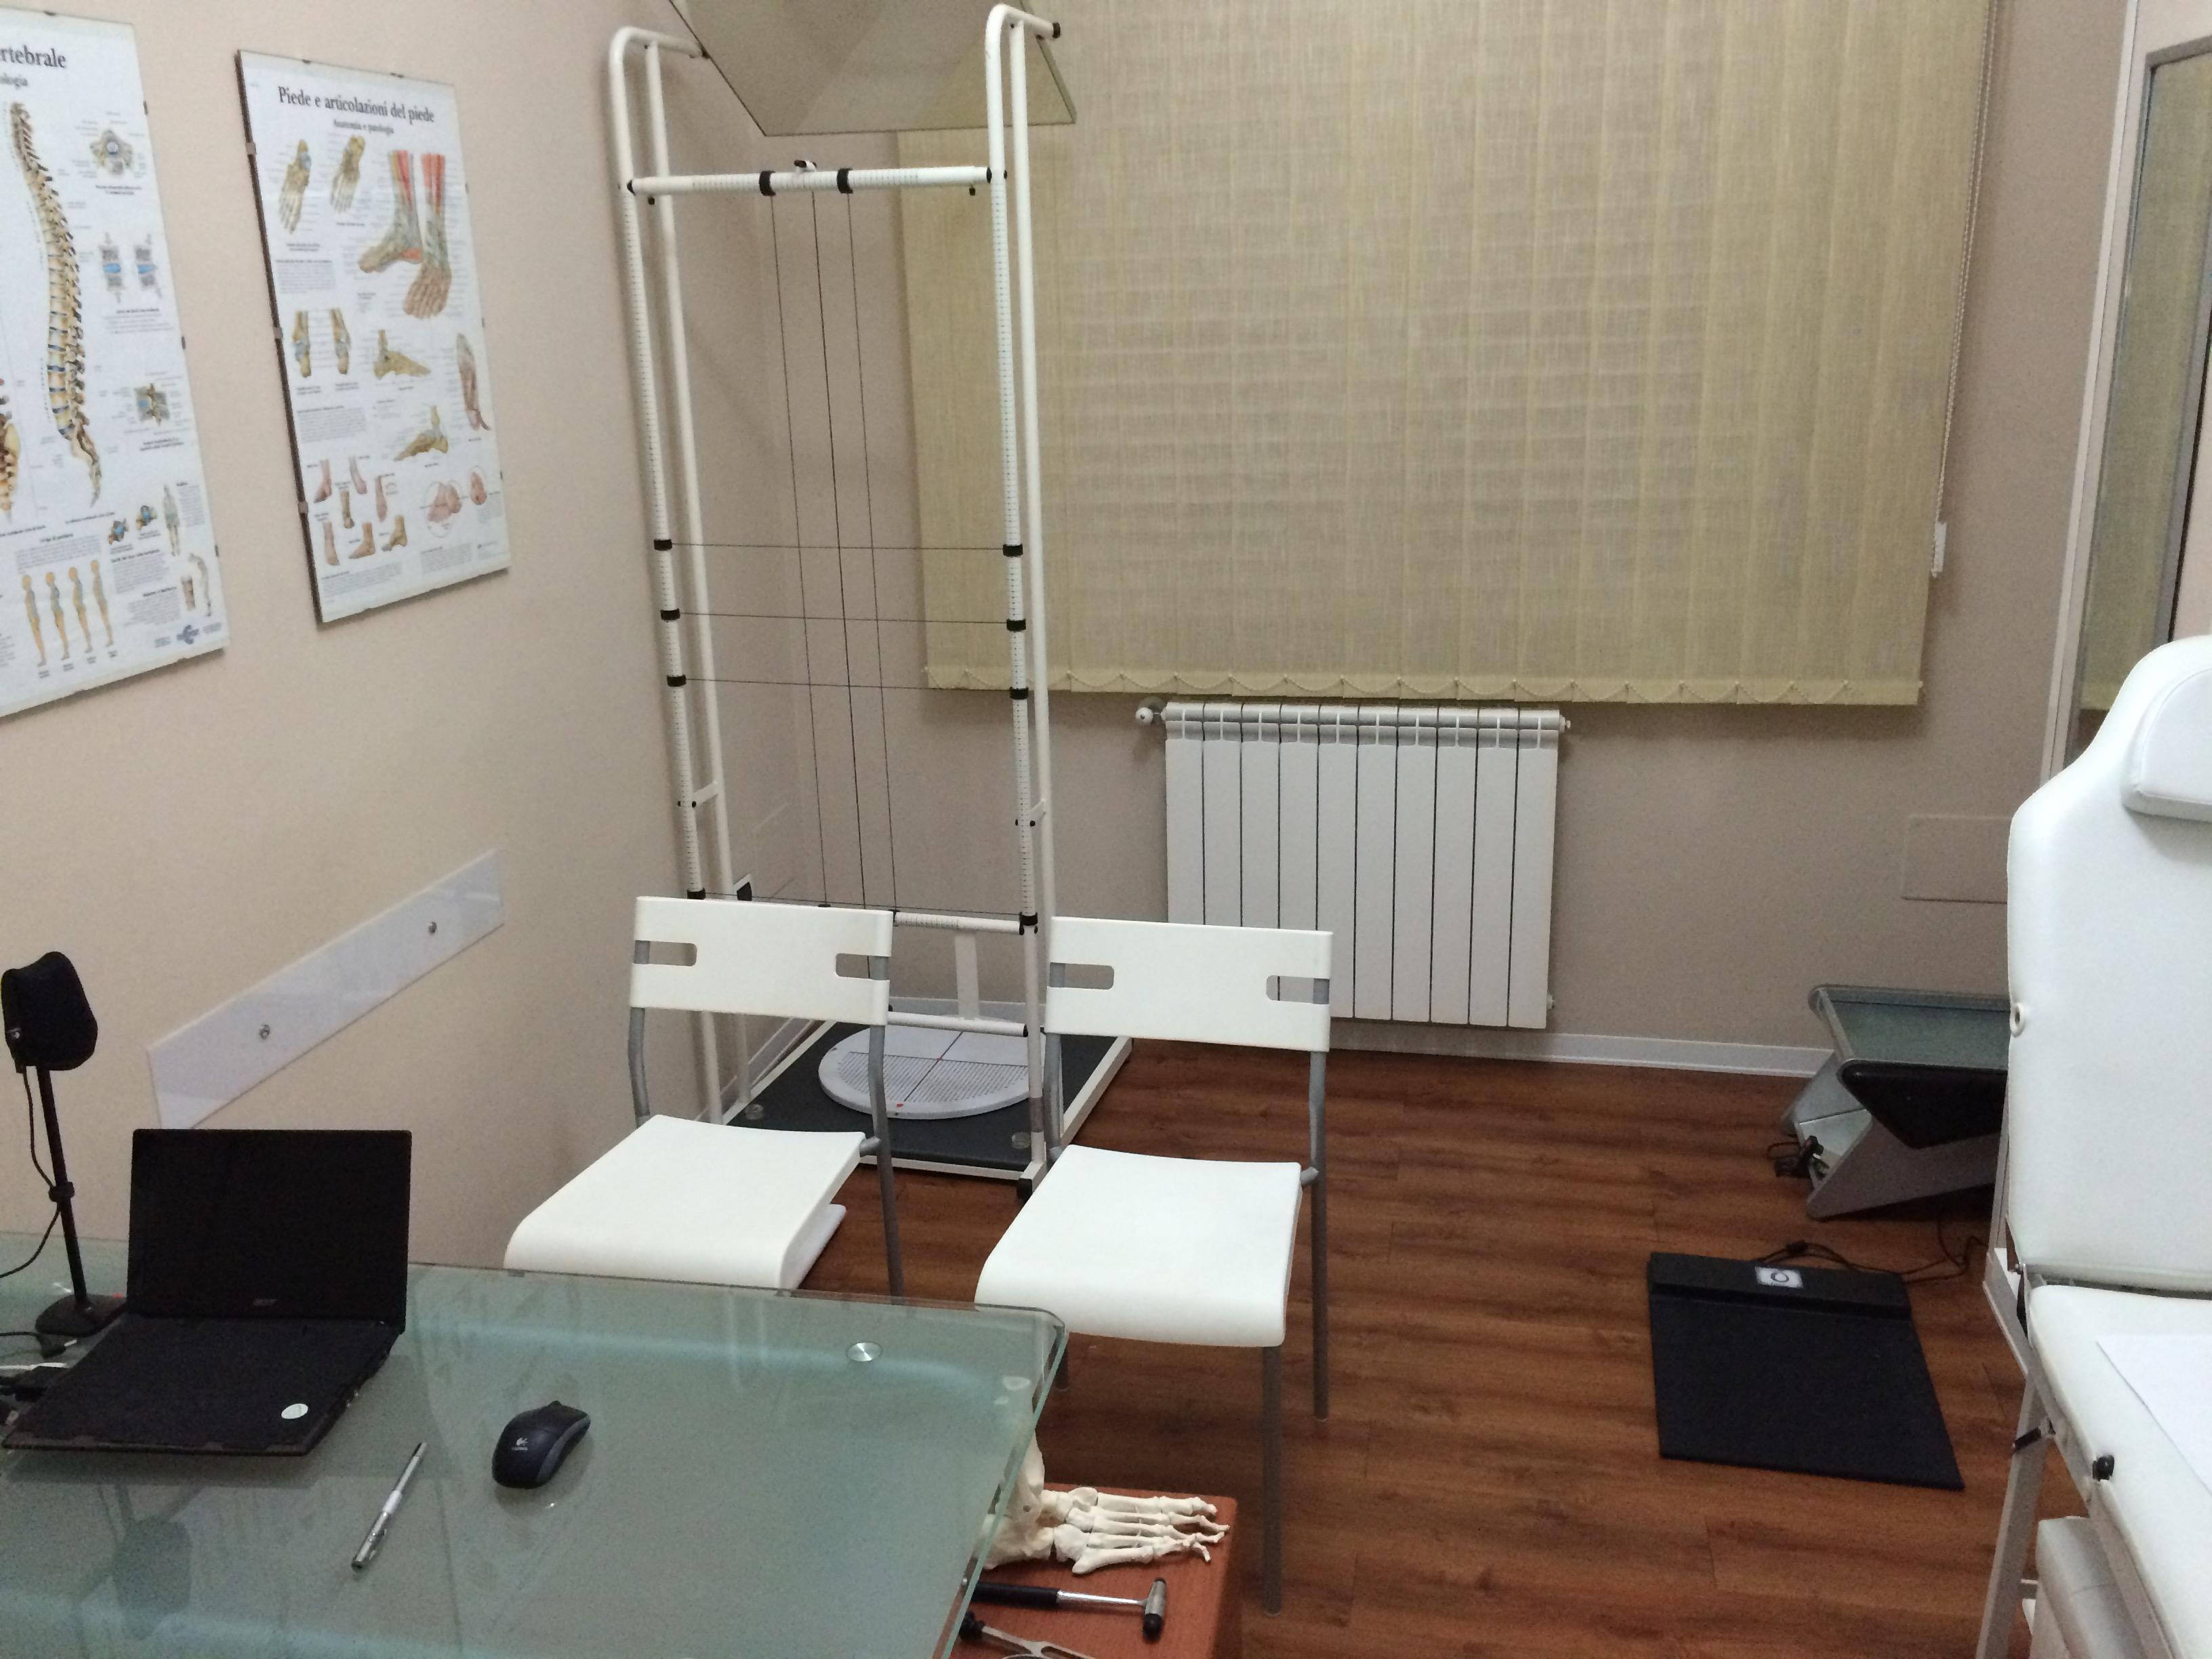 sala posturale.JPG